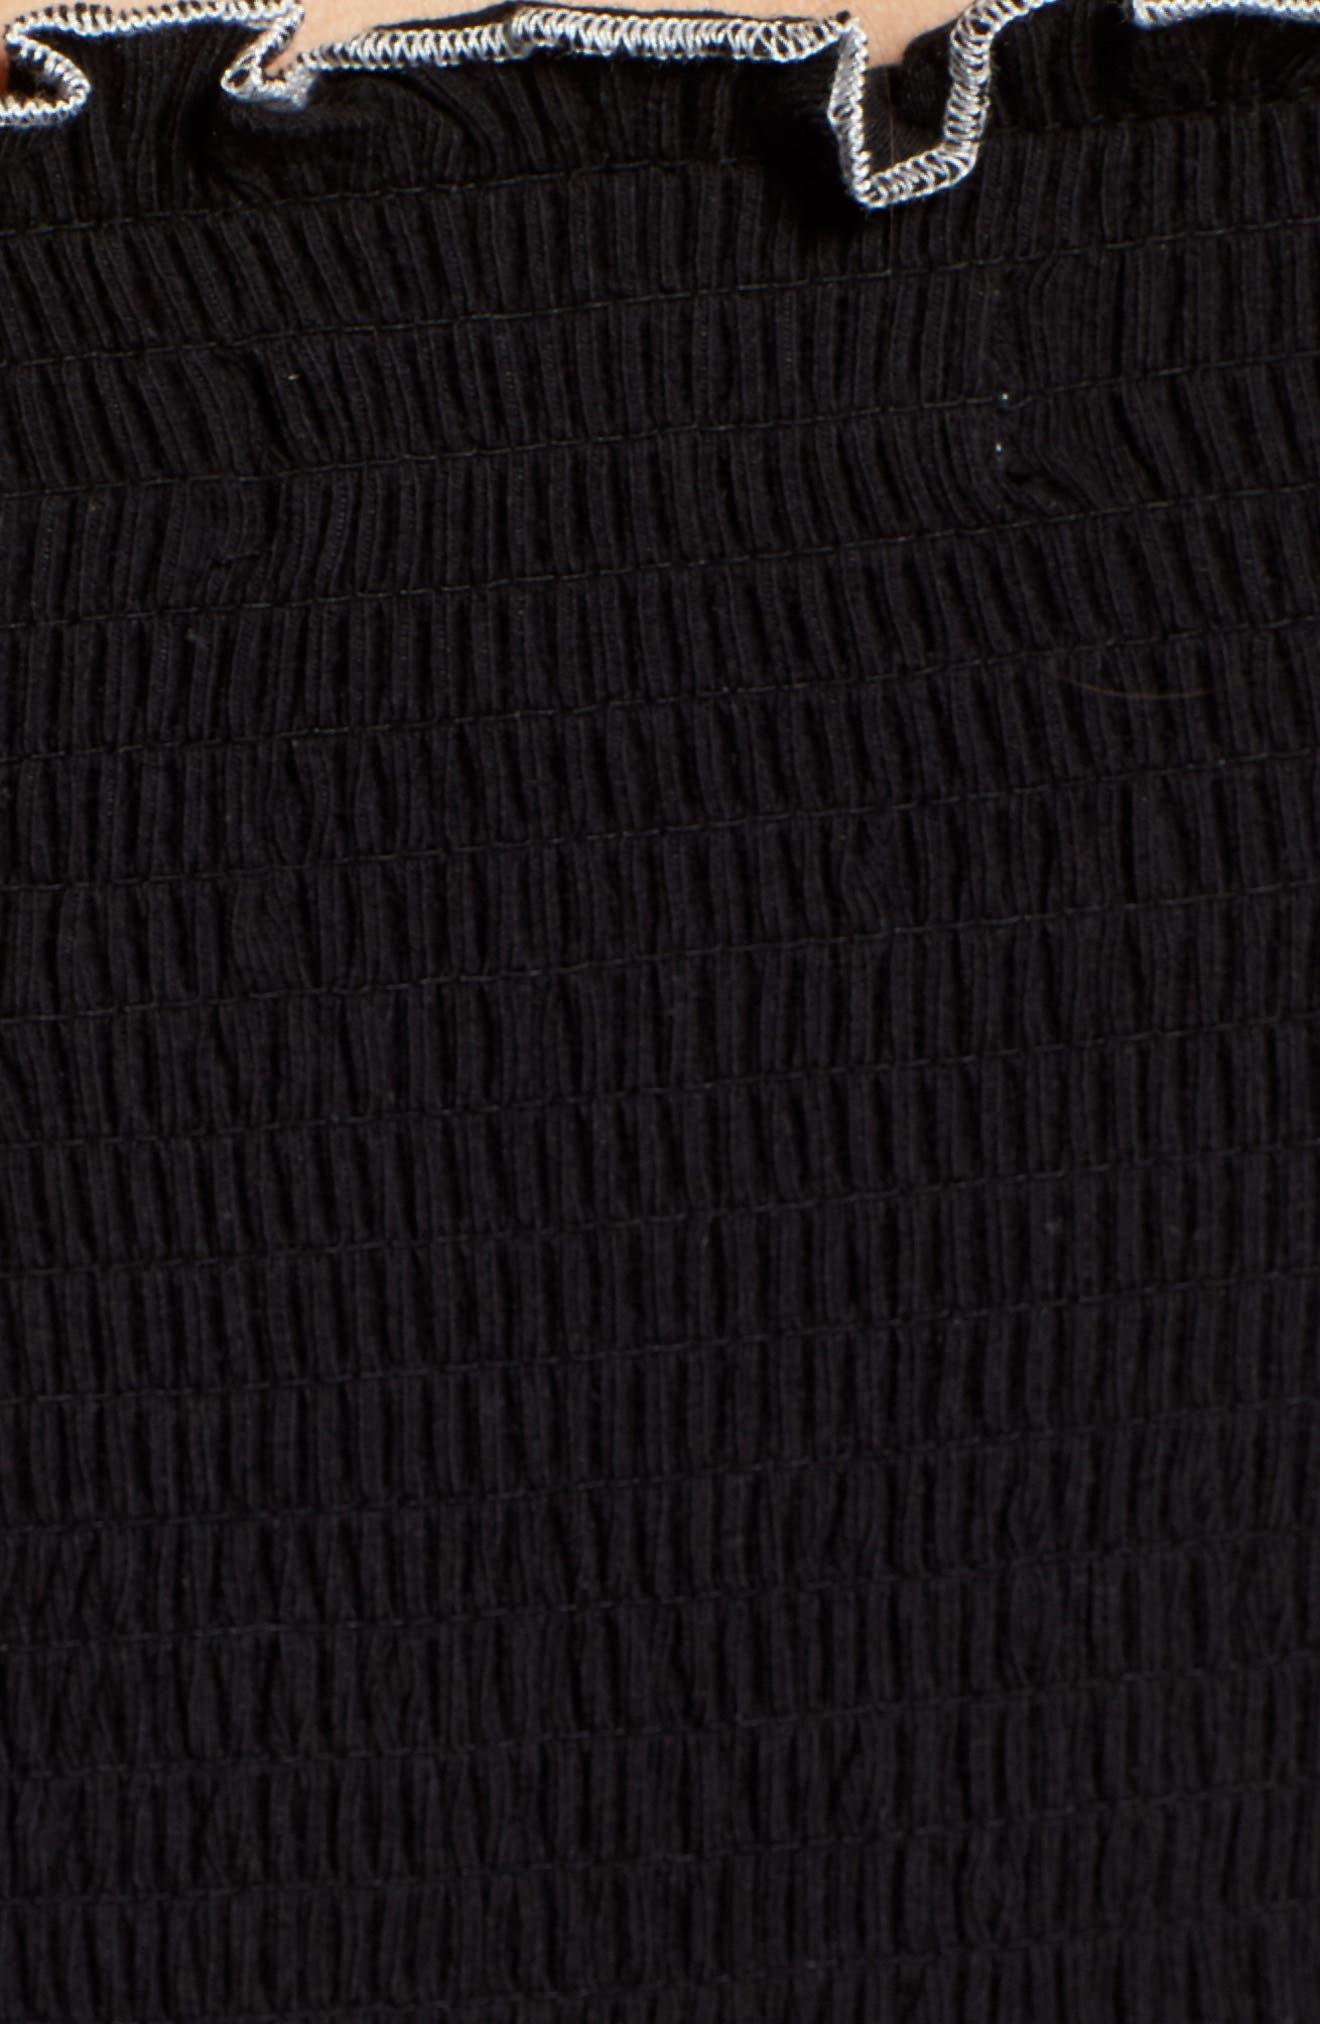 Smocked Tube Top,                             Alternate thumbnail 5, color,                             Black W/ White Trim